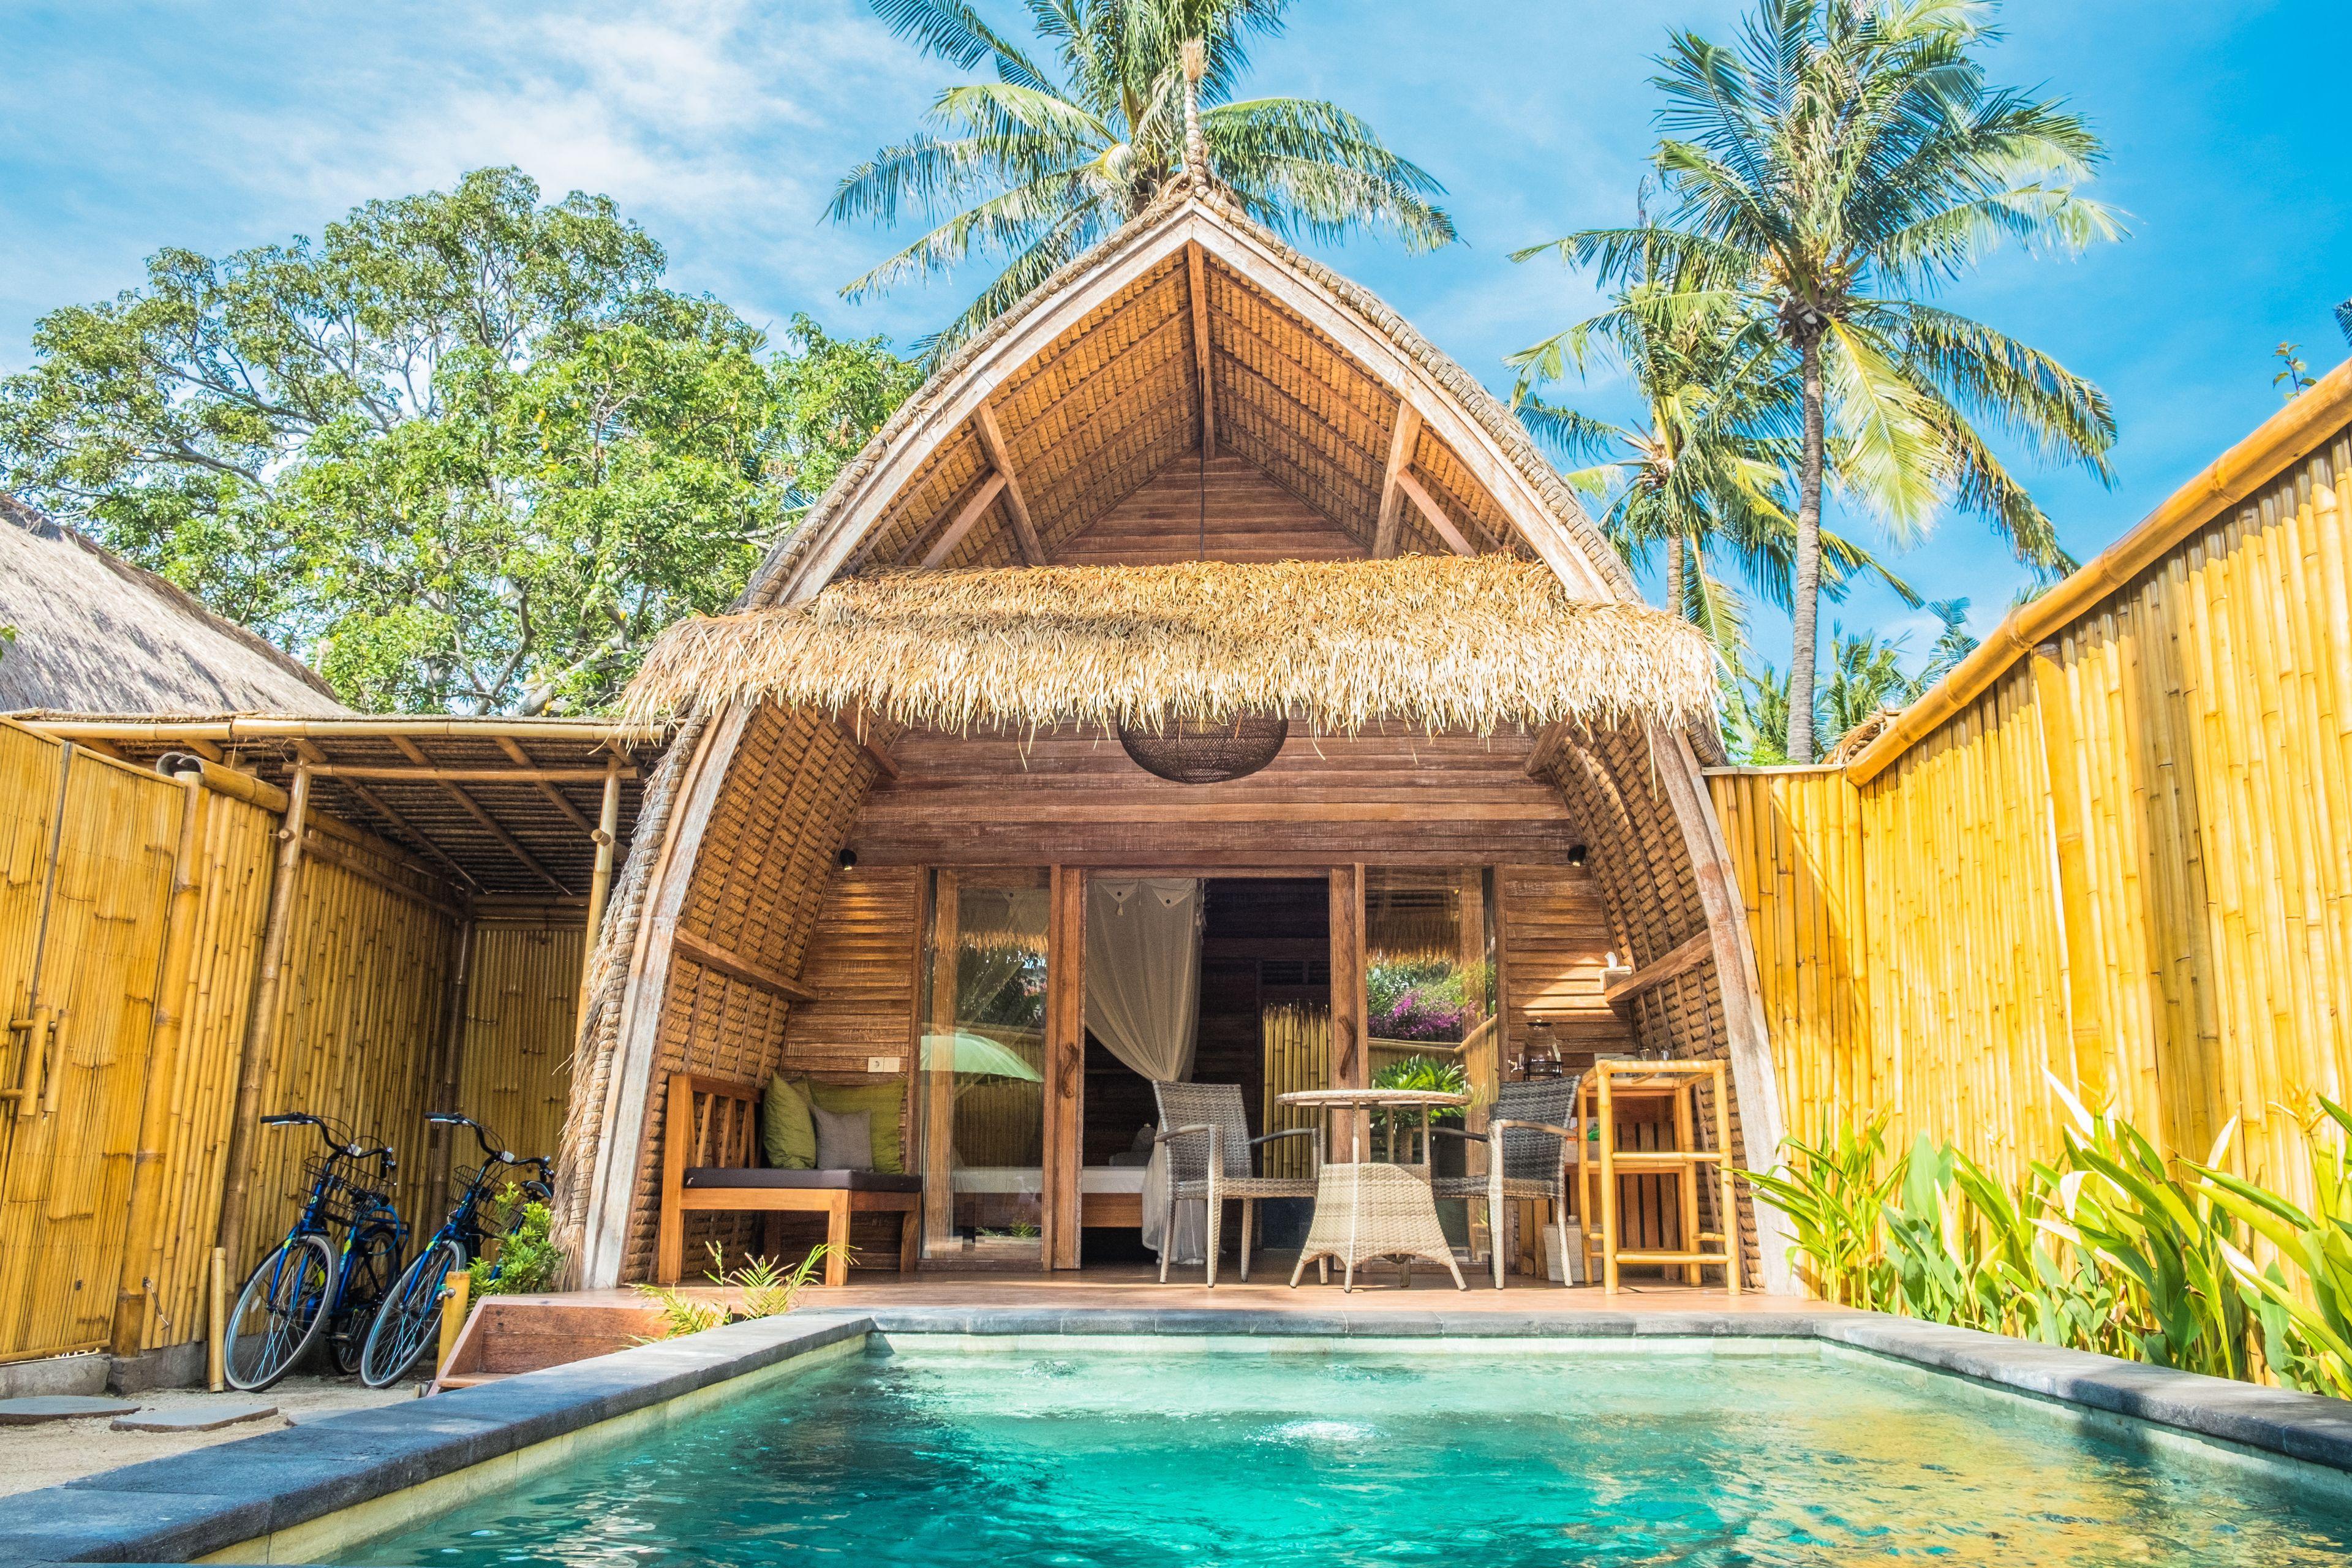 Courtesy of Anahata Tropical Private Villas / Expedia